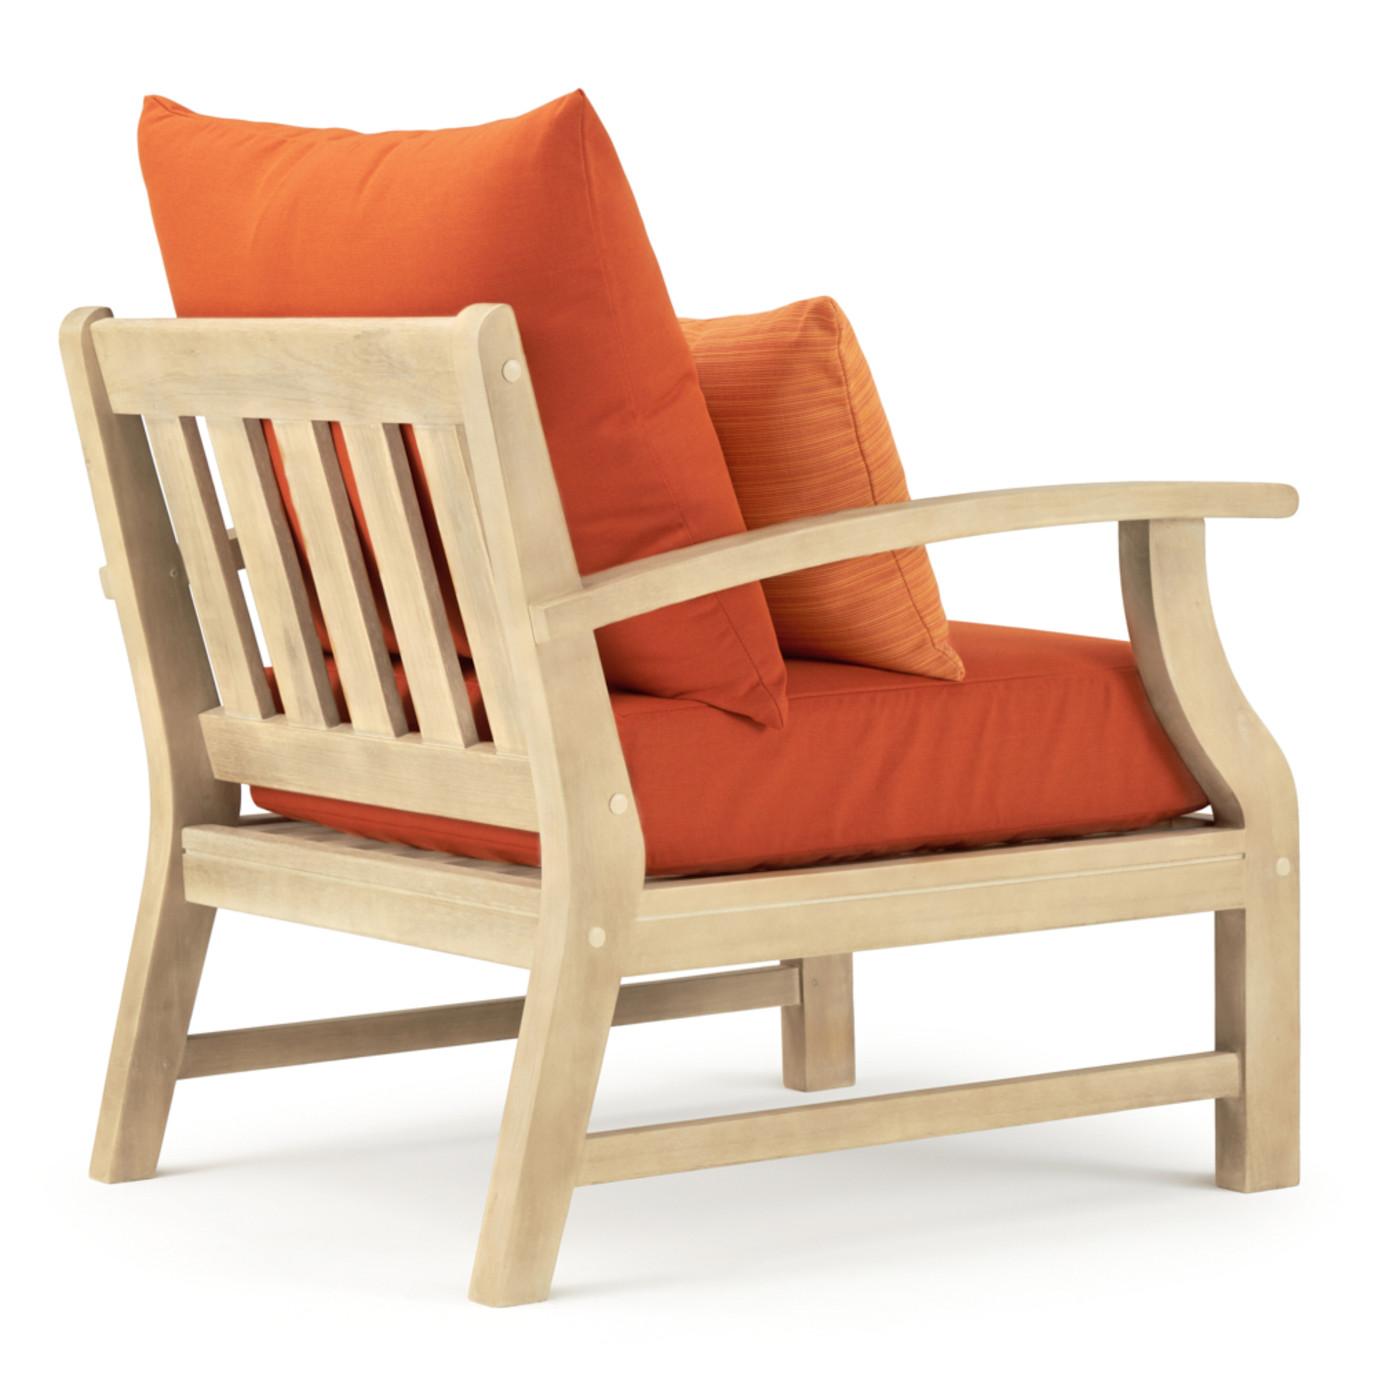 Kooper Club Chairs - Tikka Orange